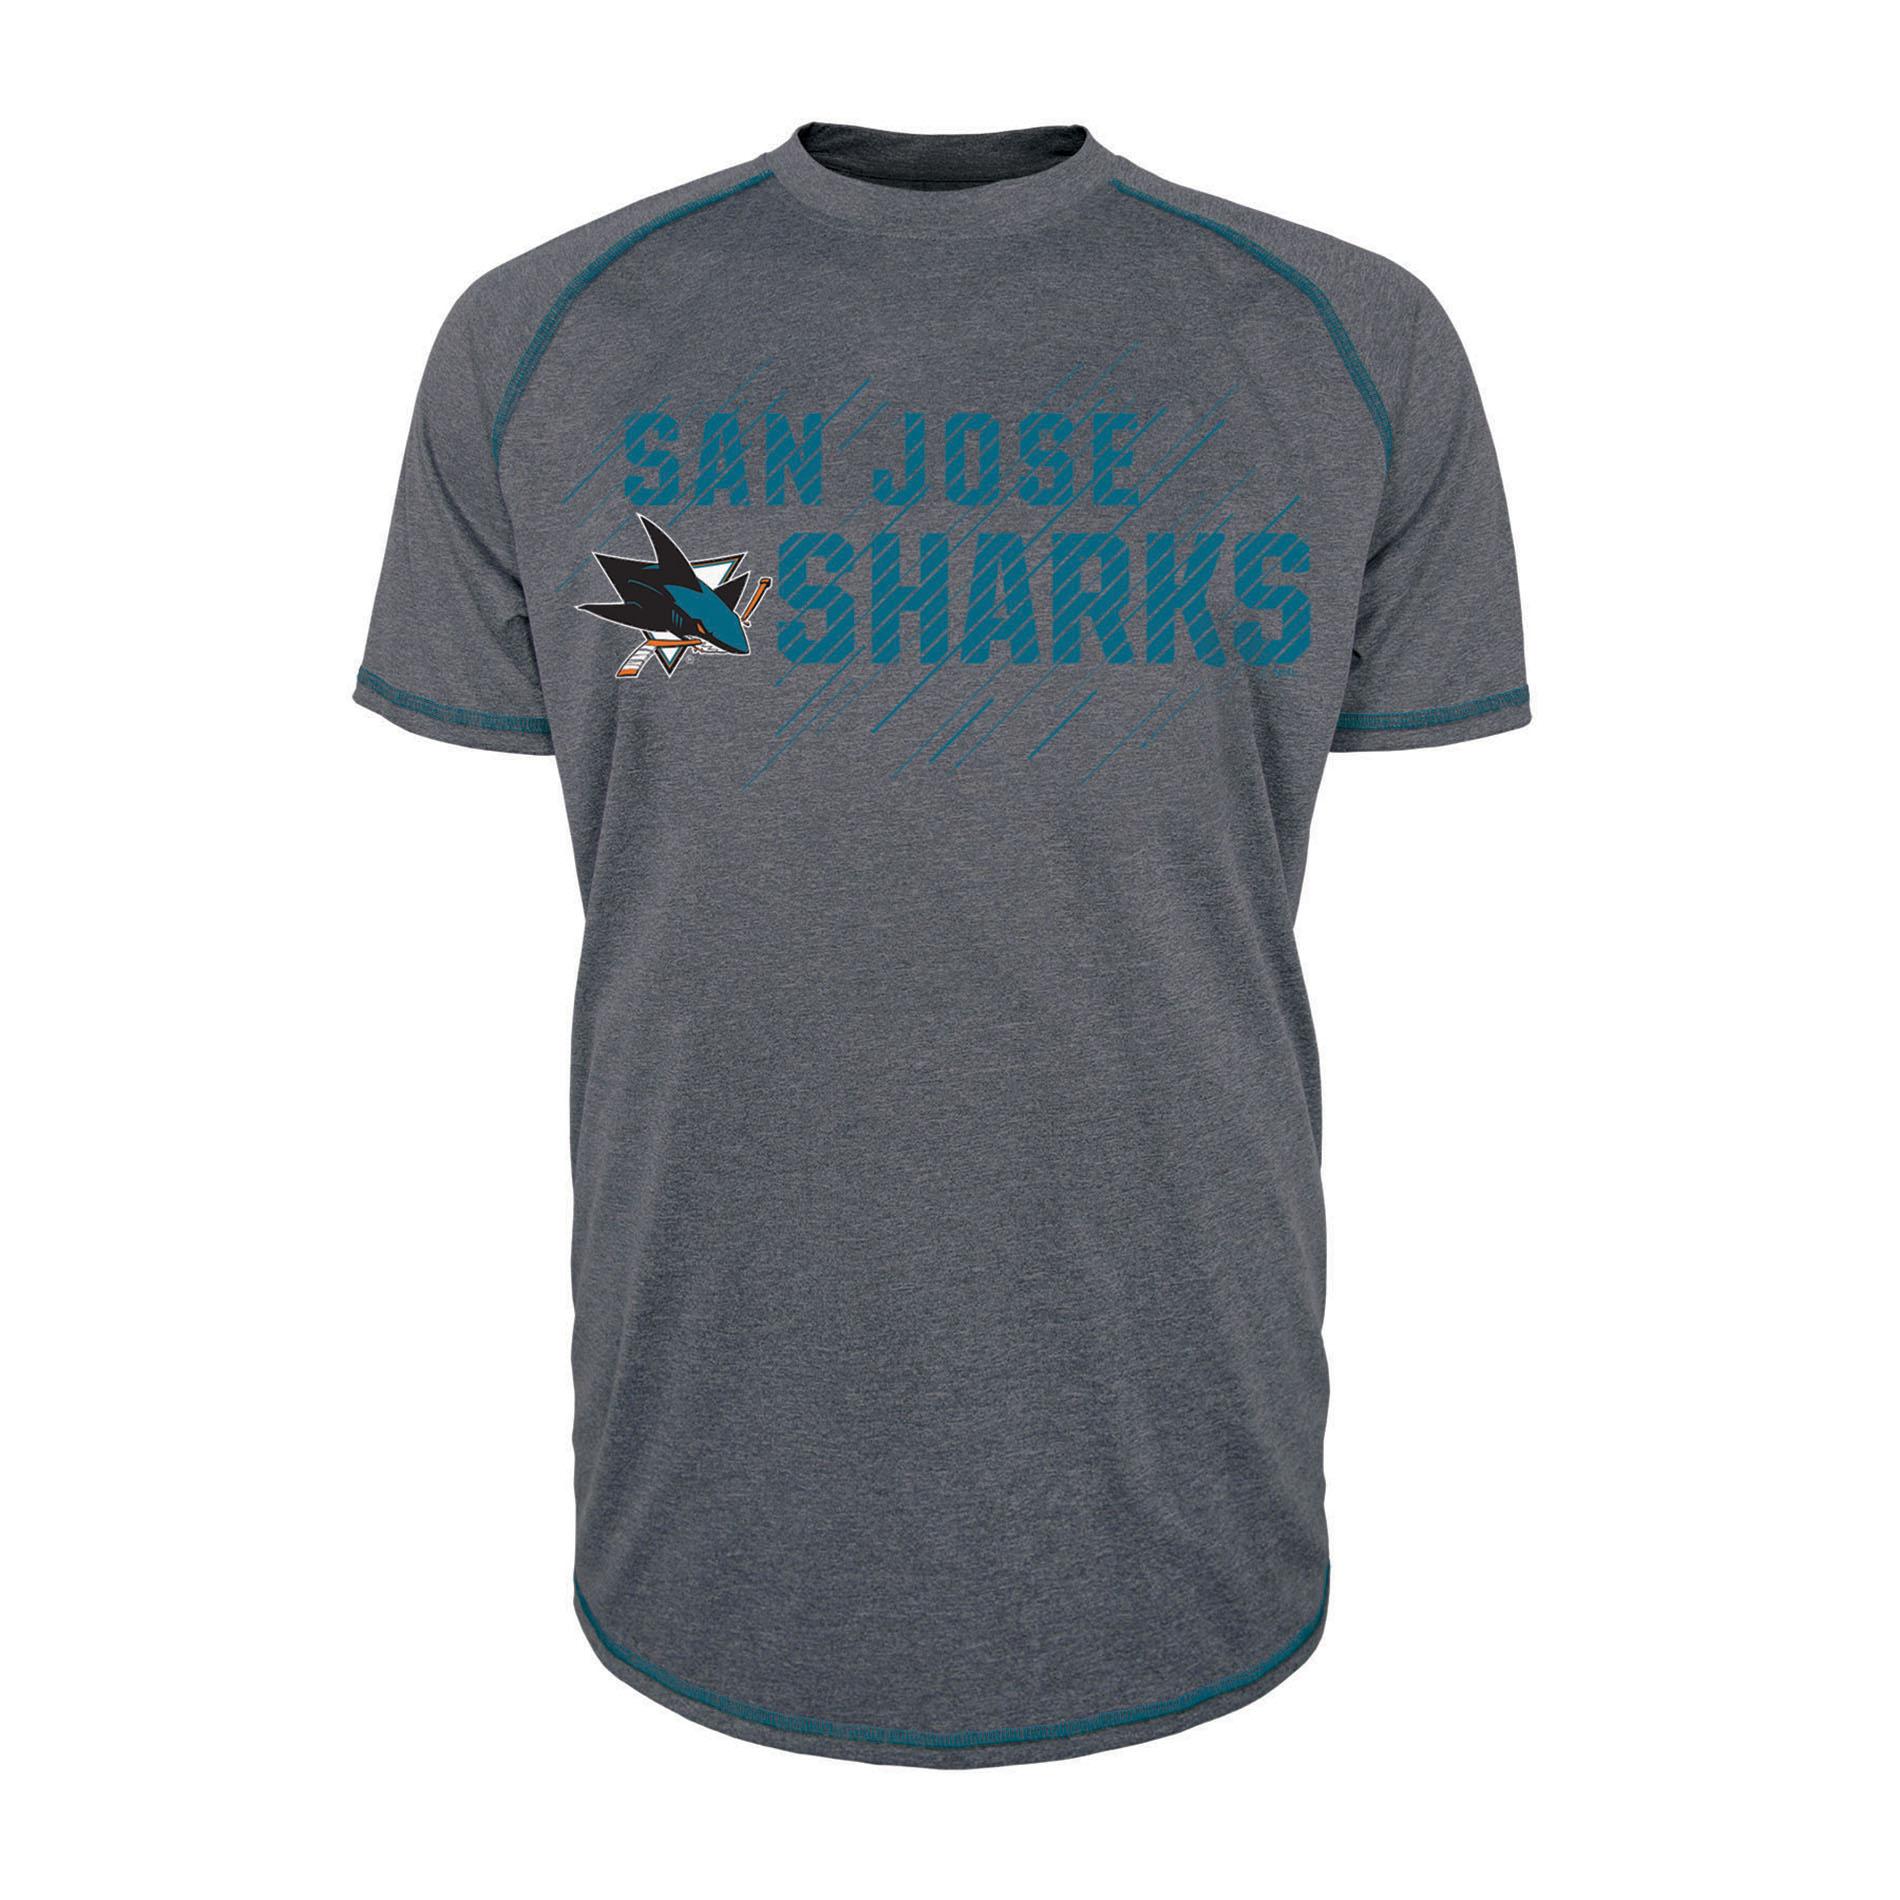 NHL Men's Short-Sleeve Raglan T-Shirt - San Jose Sharks PartNumber: 046VA100378112P MfgPartNumber: H0MCD1AKMF